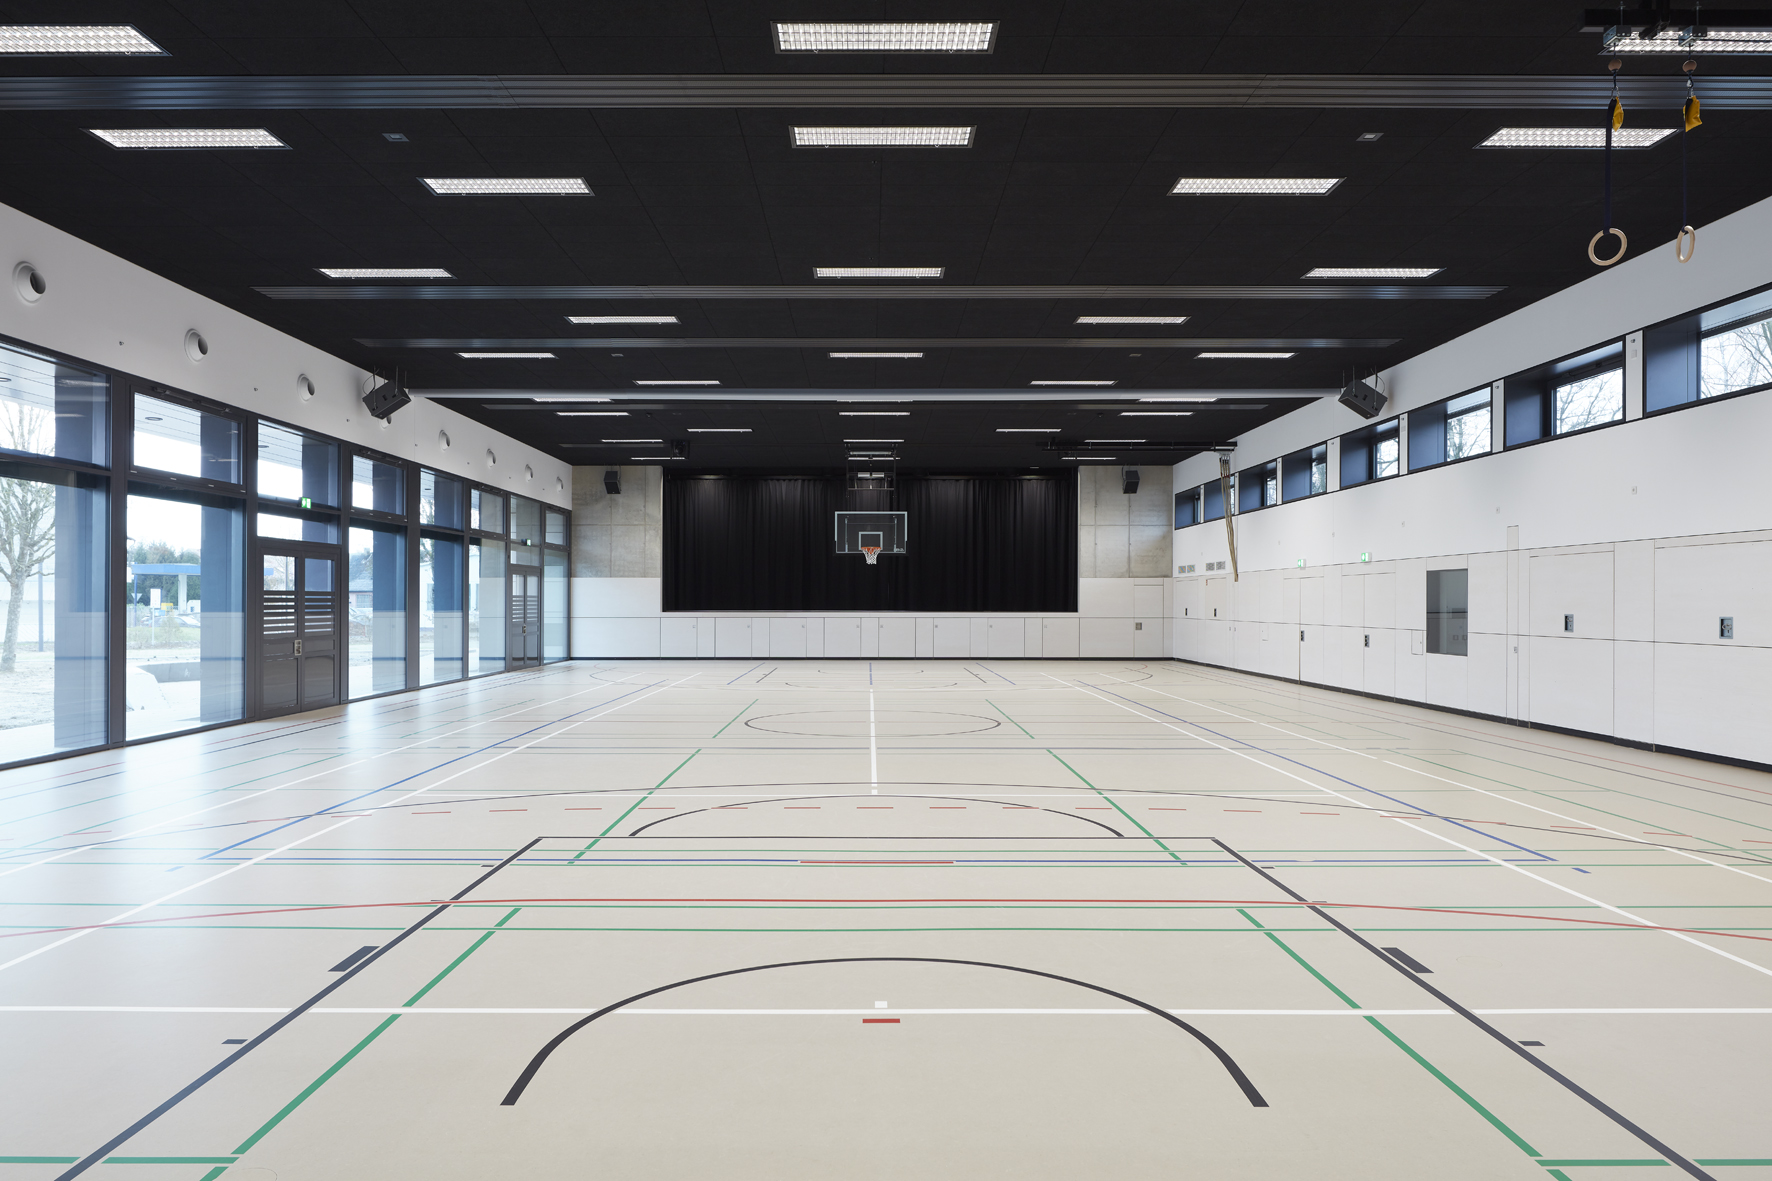 Mehrzweckhalle Massenbachhausen_samba 008